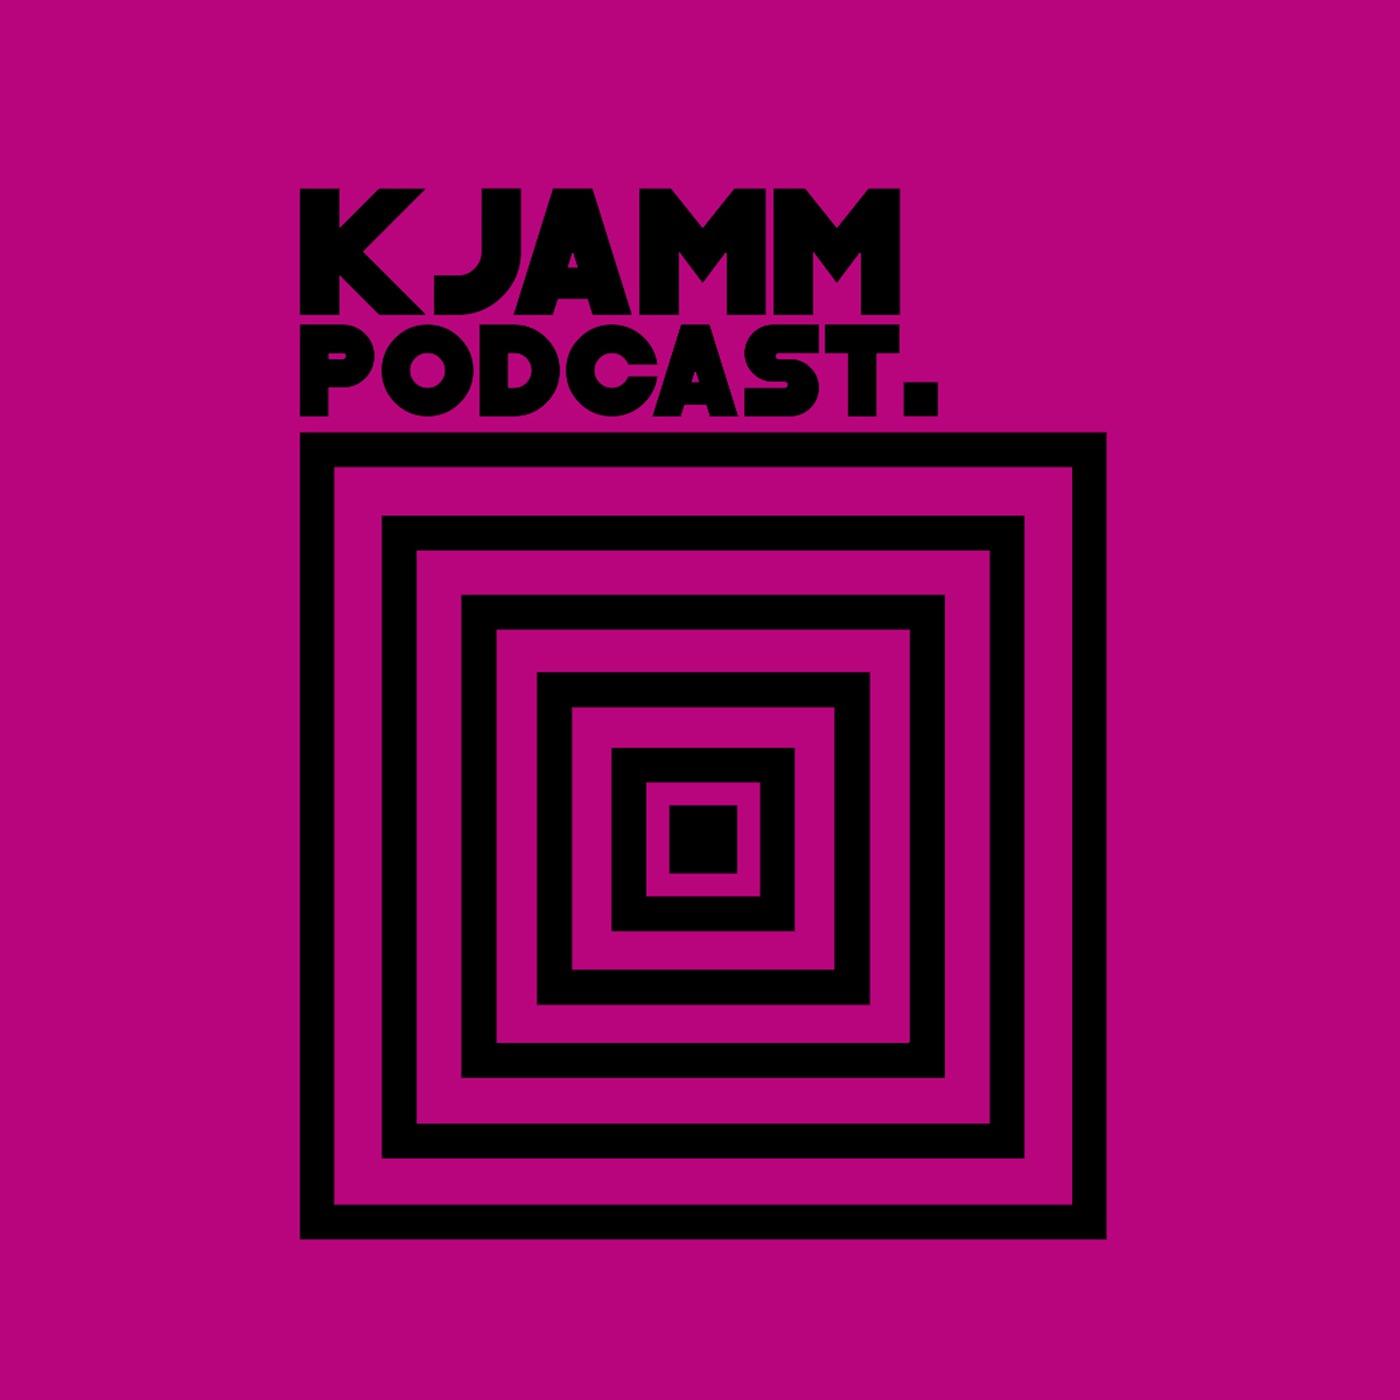 KJAMM Podcast Episode 55 KJAMM Podcast - Kpop, Jpop + Korean